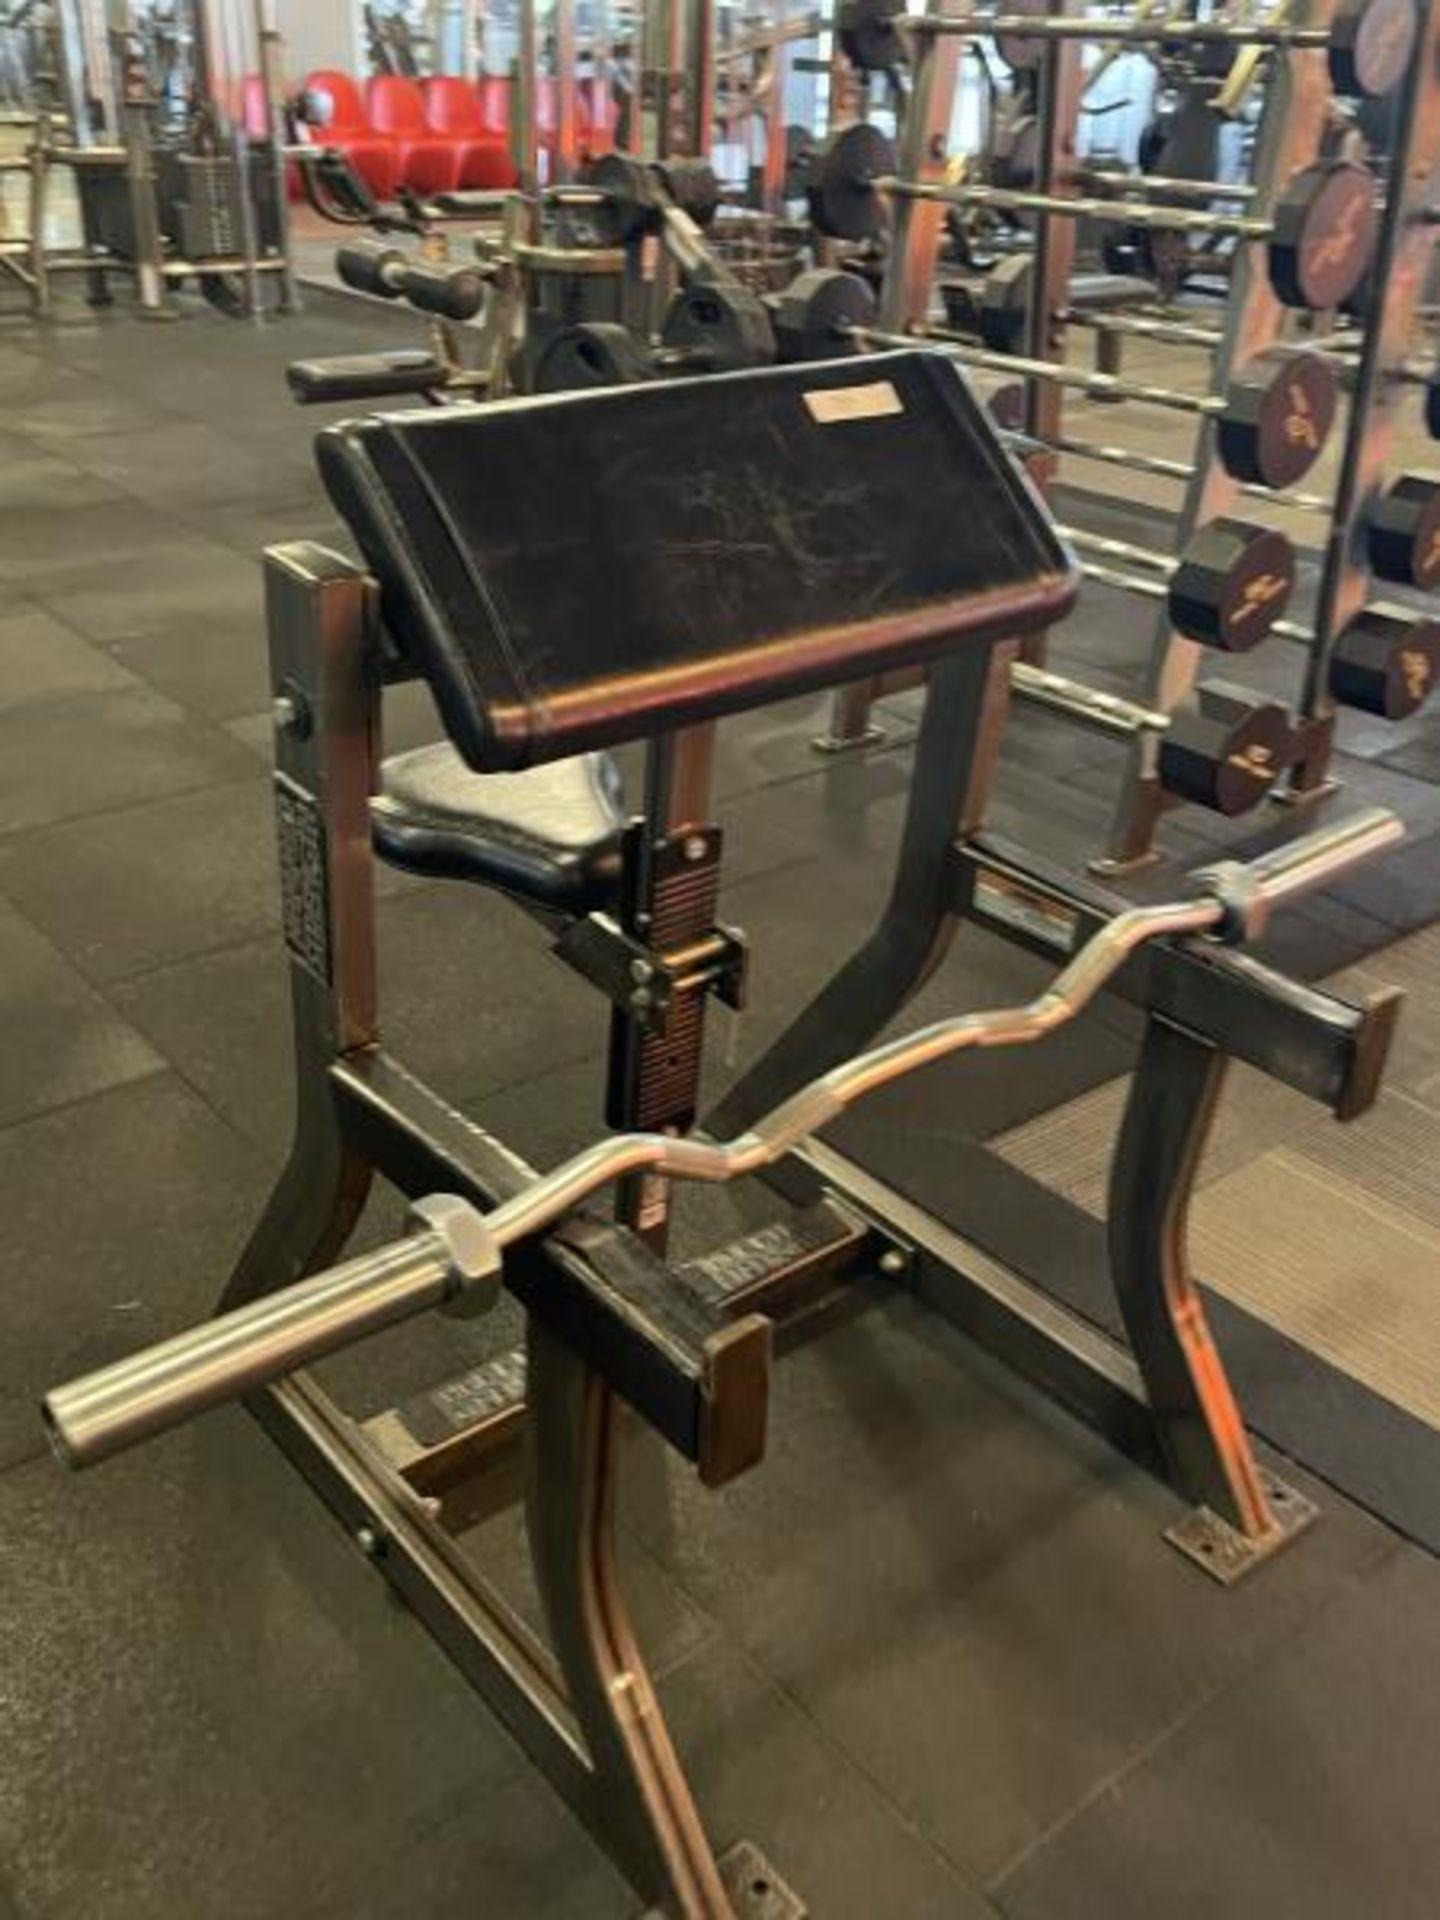 Hammer Strength Bicep/Preacher Curl Bench with Curl Bar M:B01